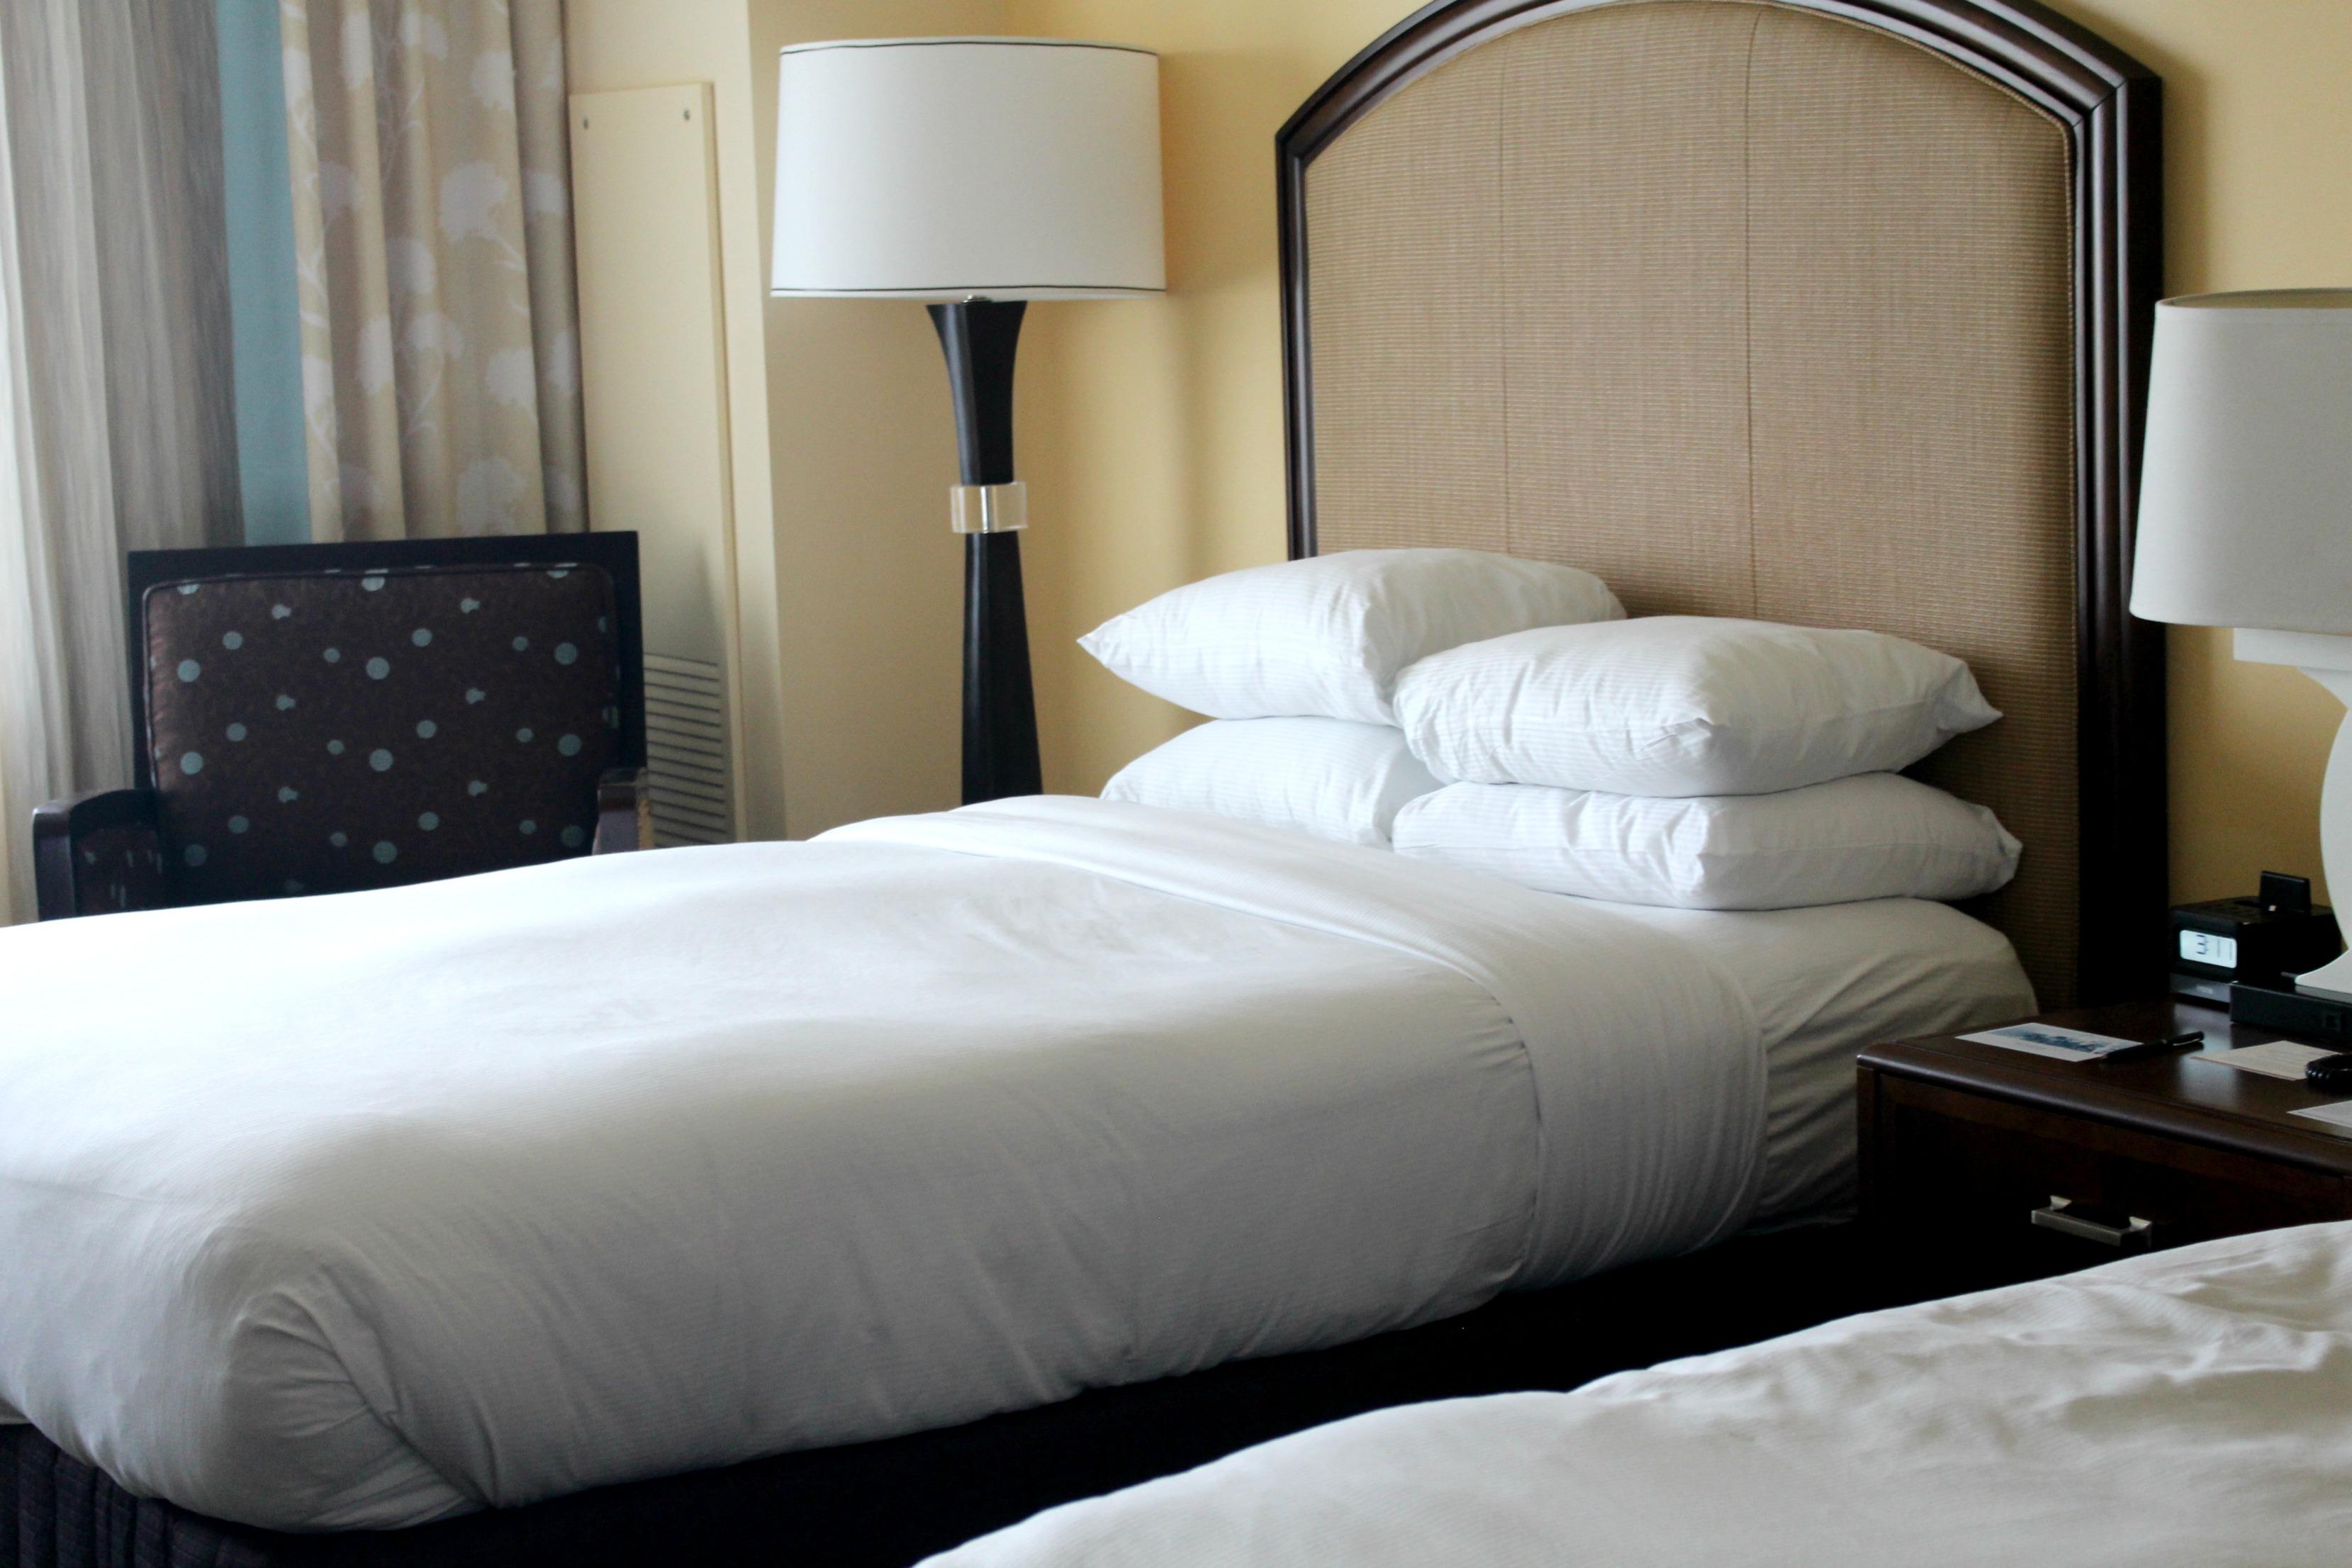 Hilton-Bonnet-Creek-Disney-Resort-Rooms-review